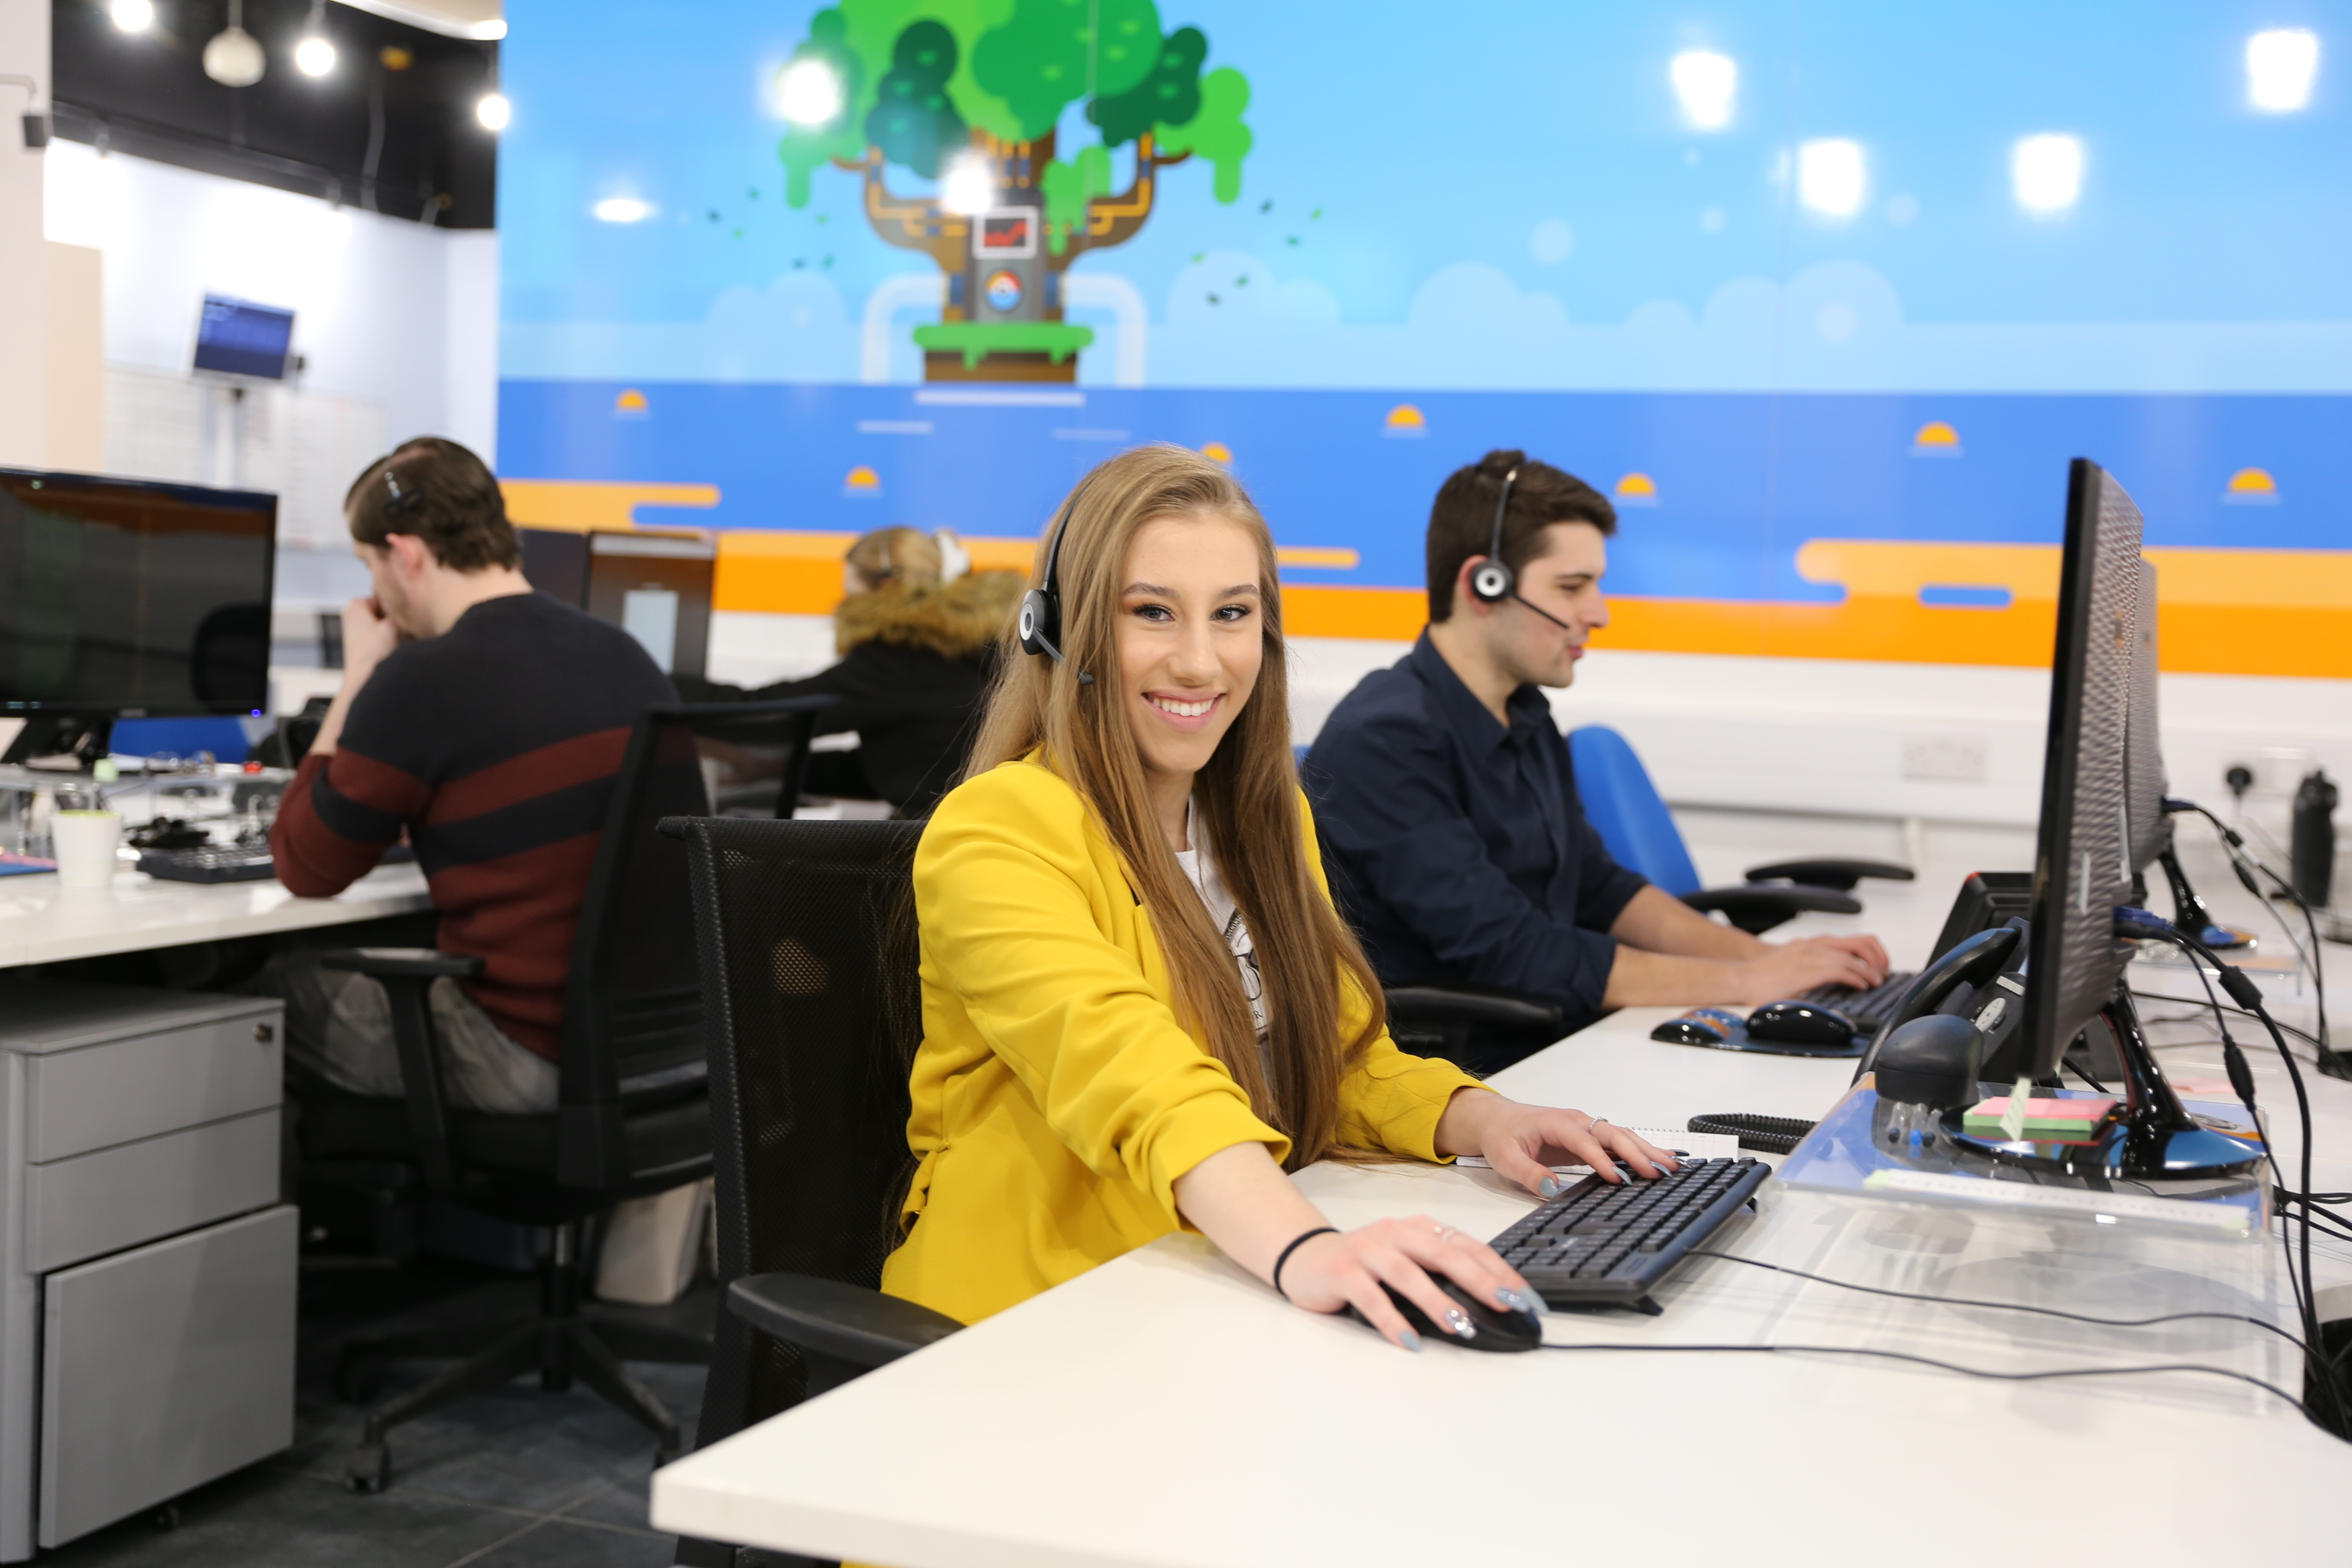 Emilie Brylak, part of the customer care team at DJS (UK) Limited